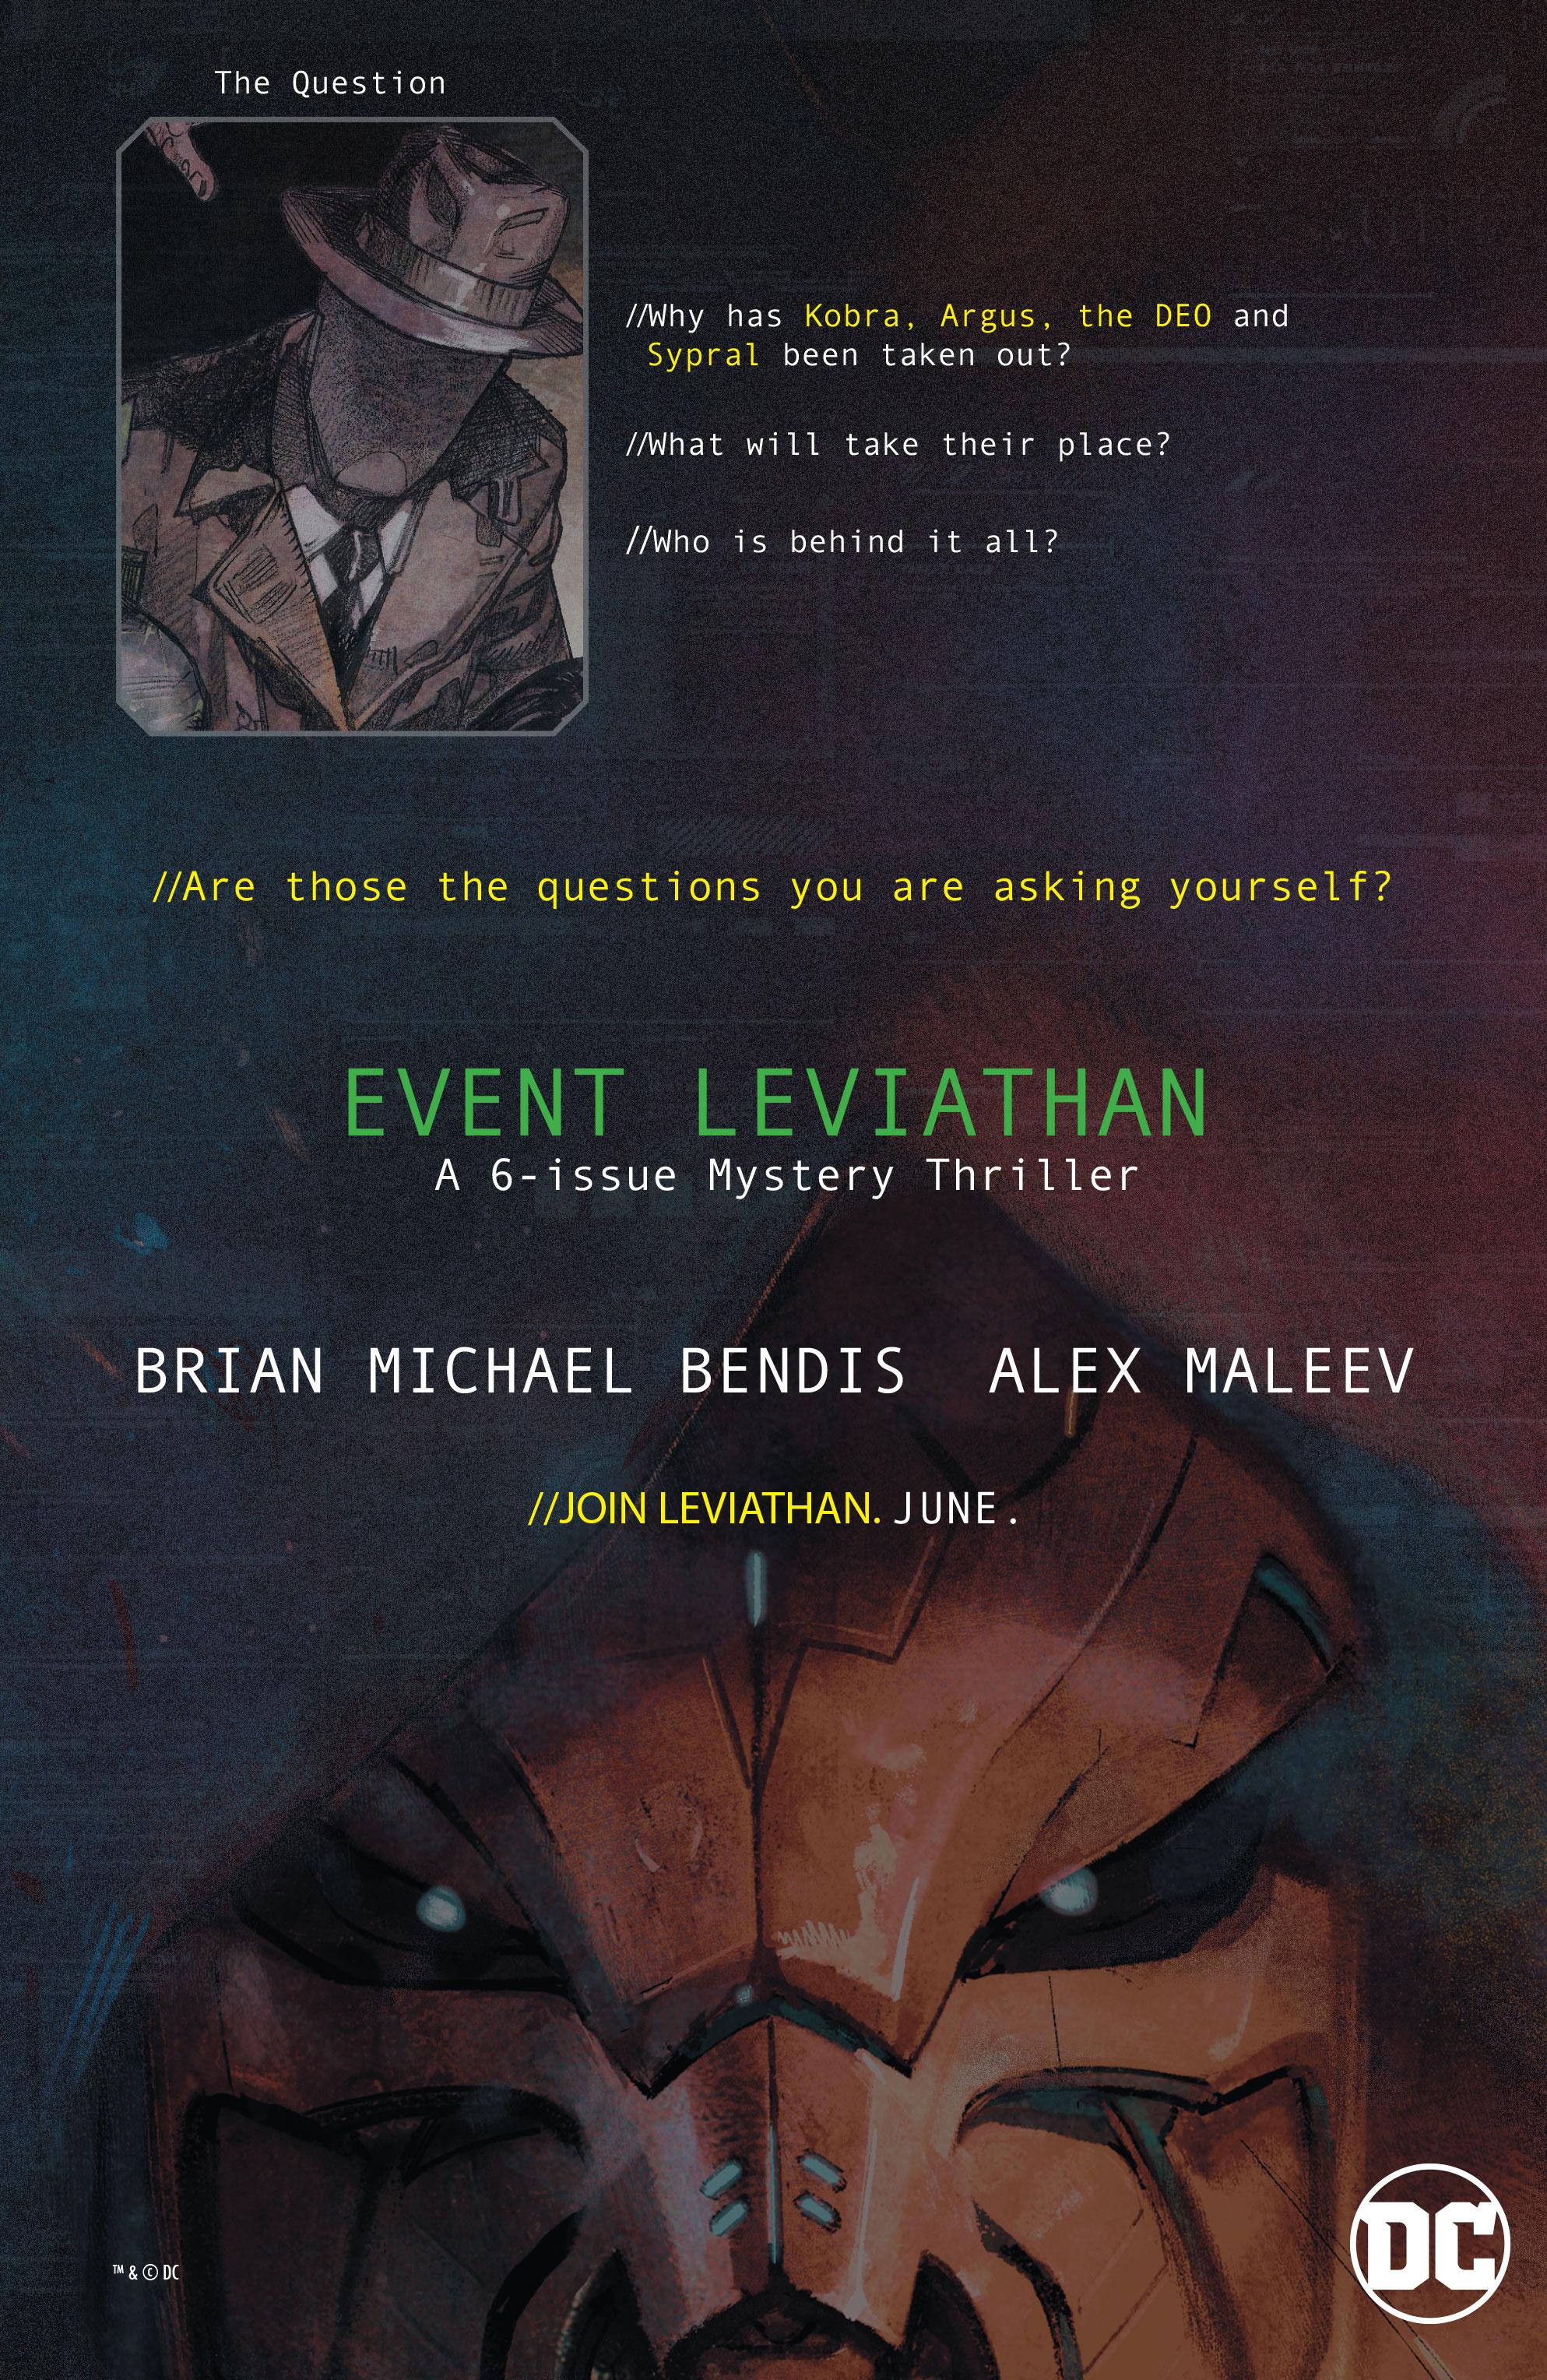 Event-Leviathan-7.jpg